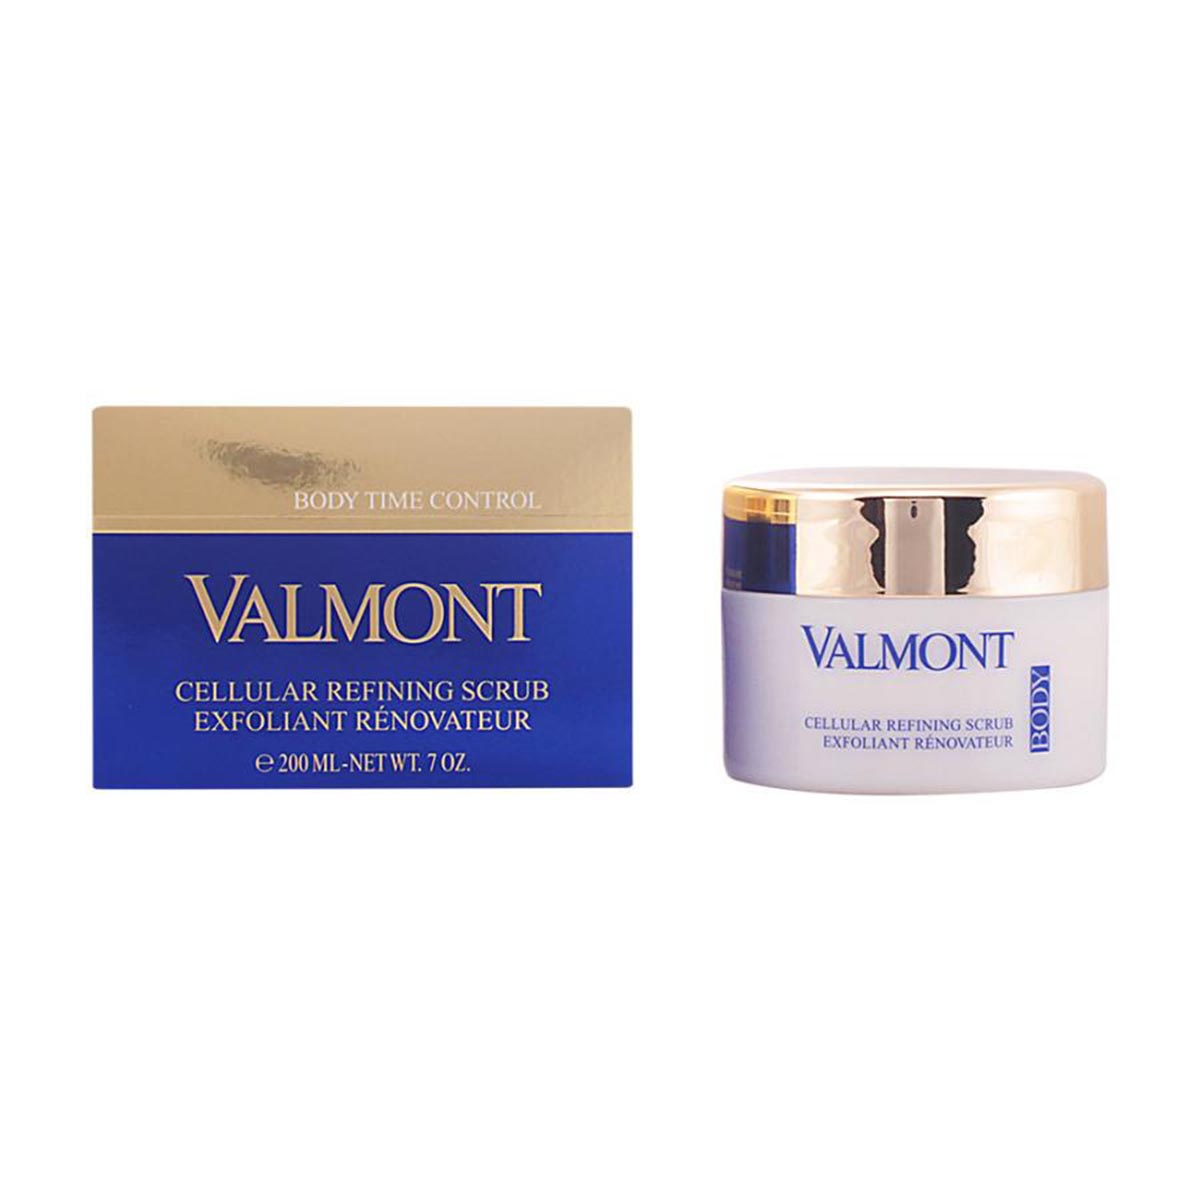 Valmont body time control cellular refining scrub 200ml